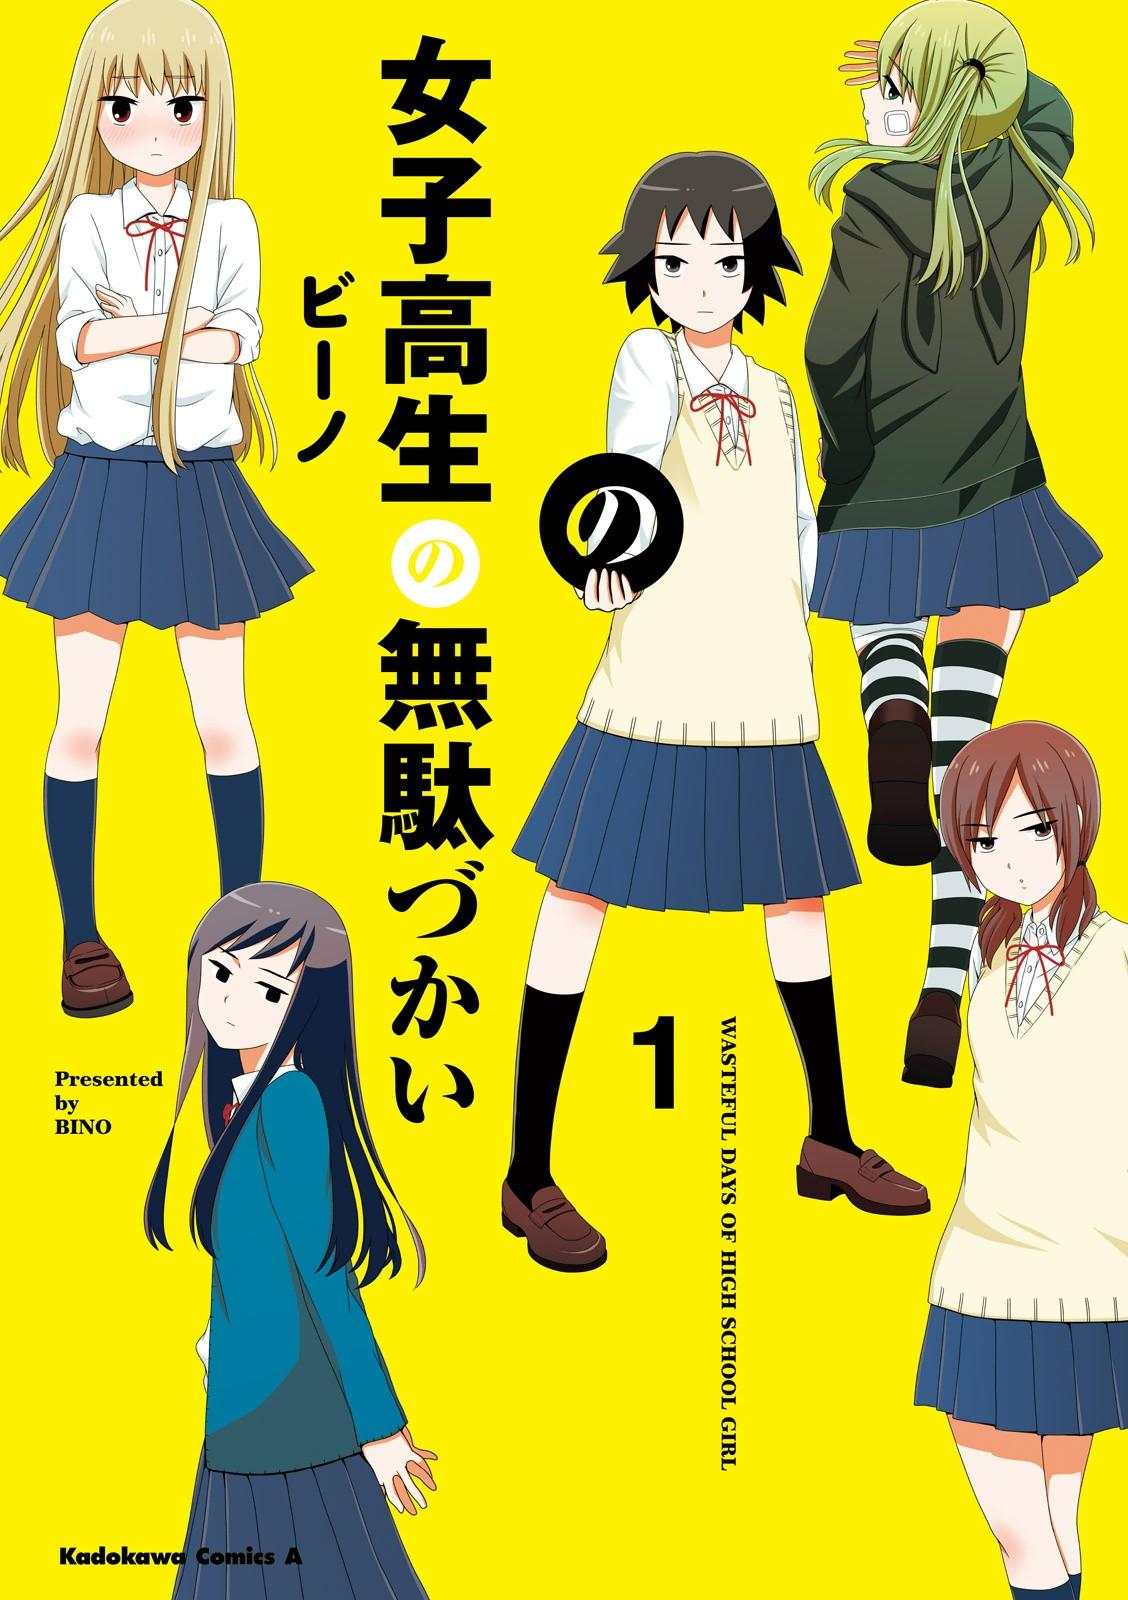 Aimechan93/Propuesta de doblaje Joshikousei no Mudazukai